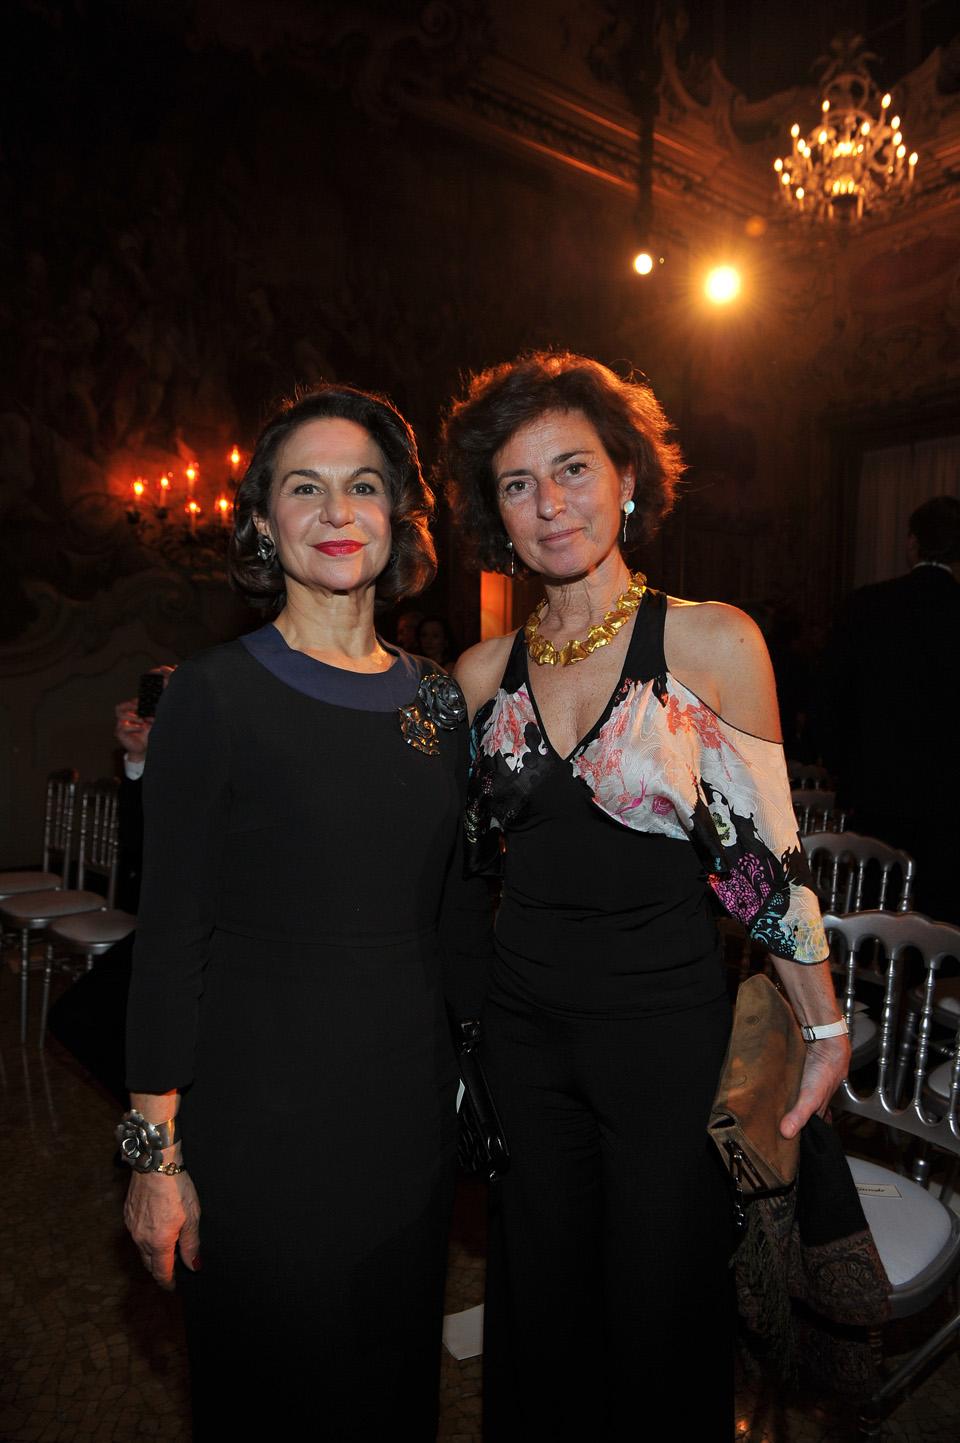 Floriana Mentasti & Elena Bragiotti